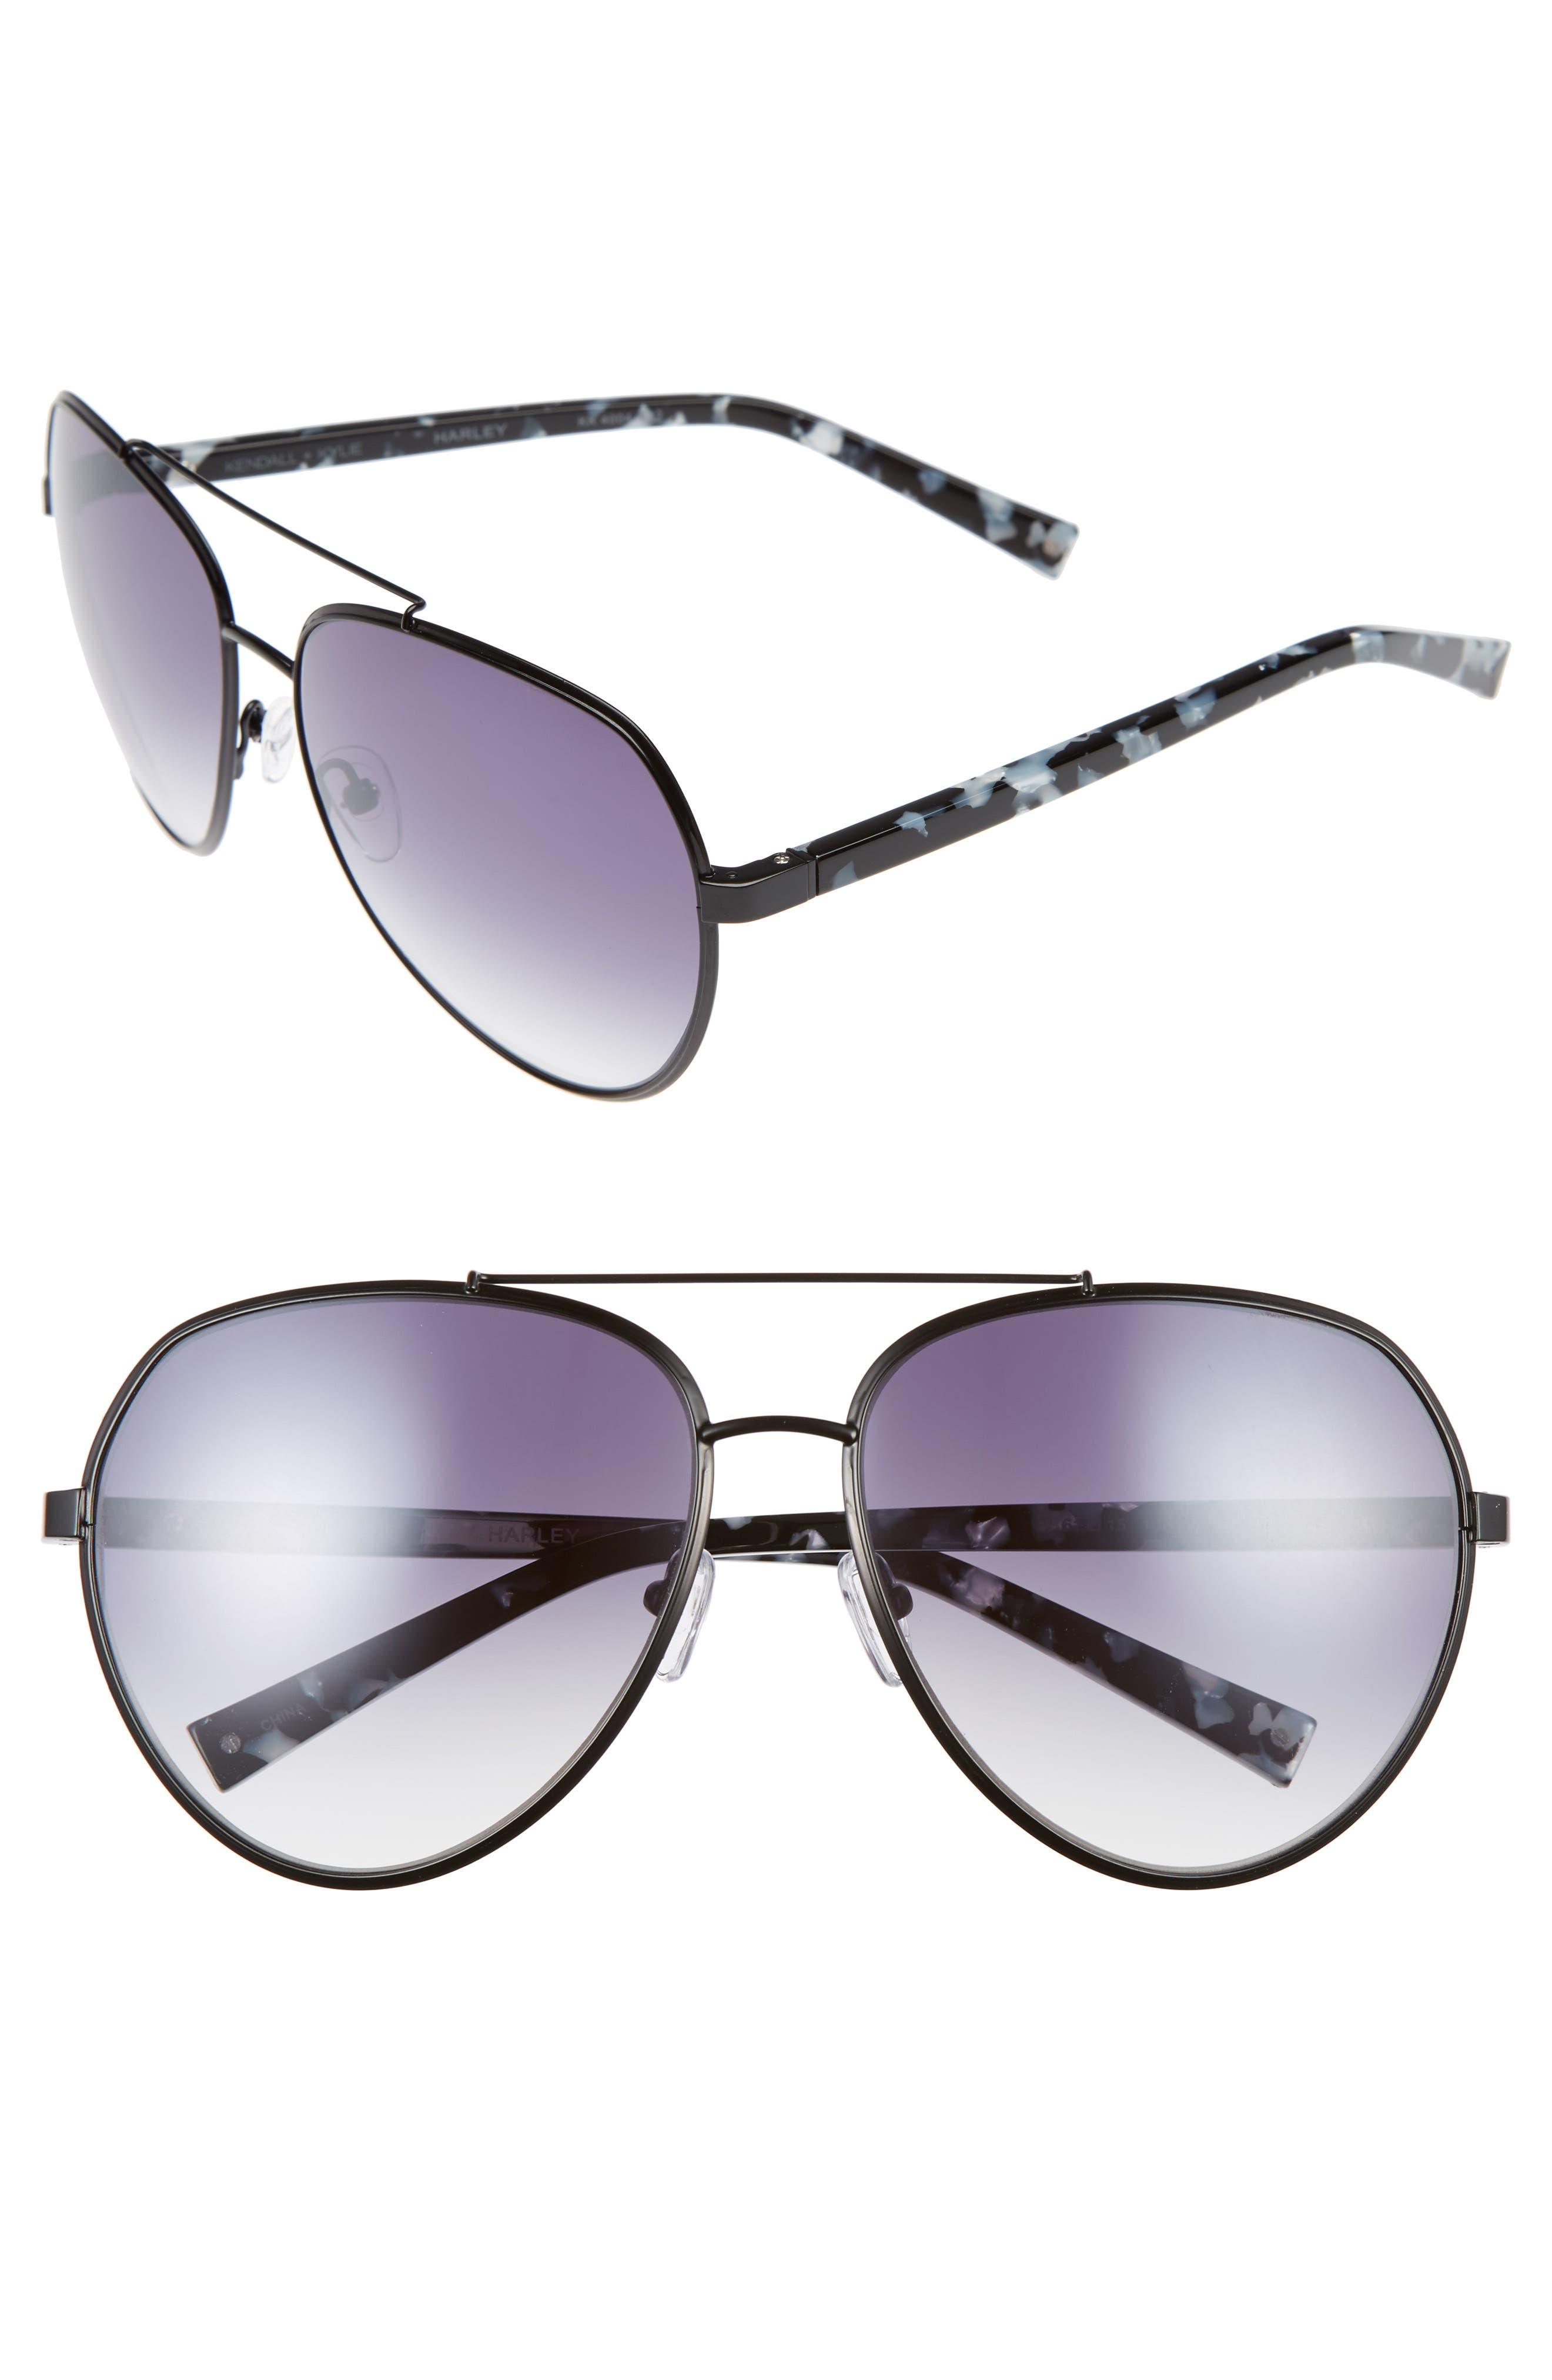 61mm Aviator Sunglasses,                         Main,                         color, 001